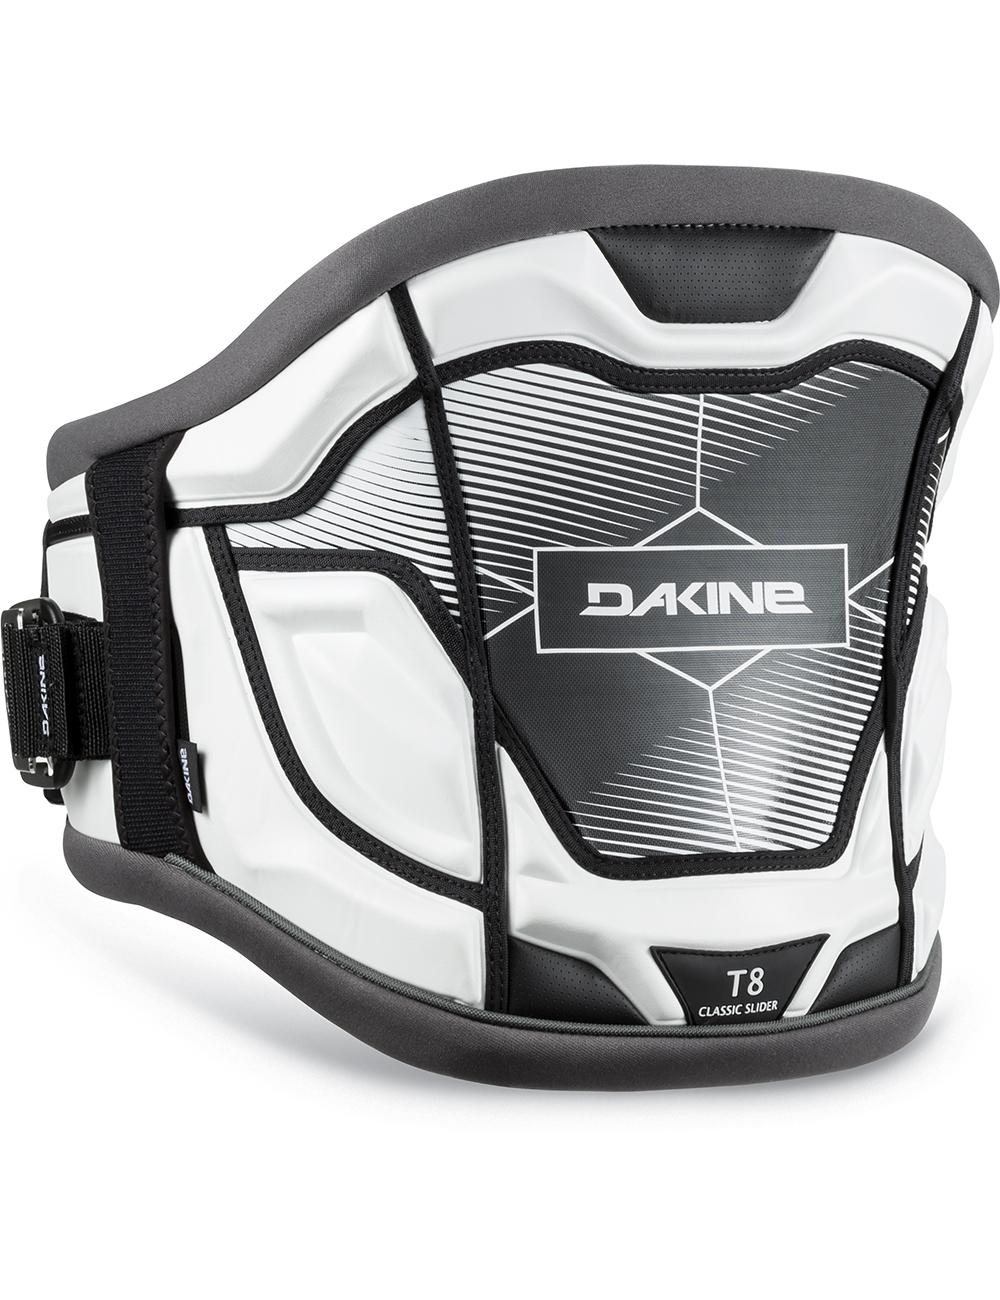 Dakine T8 Windsurf Harness 2018 - 2XS